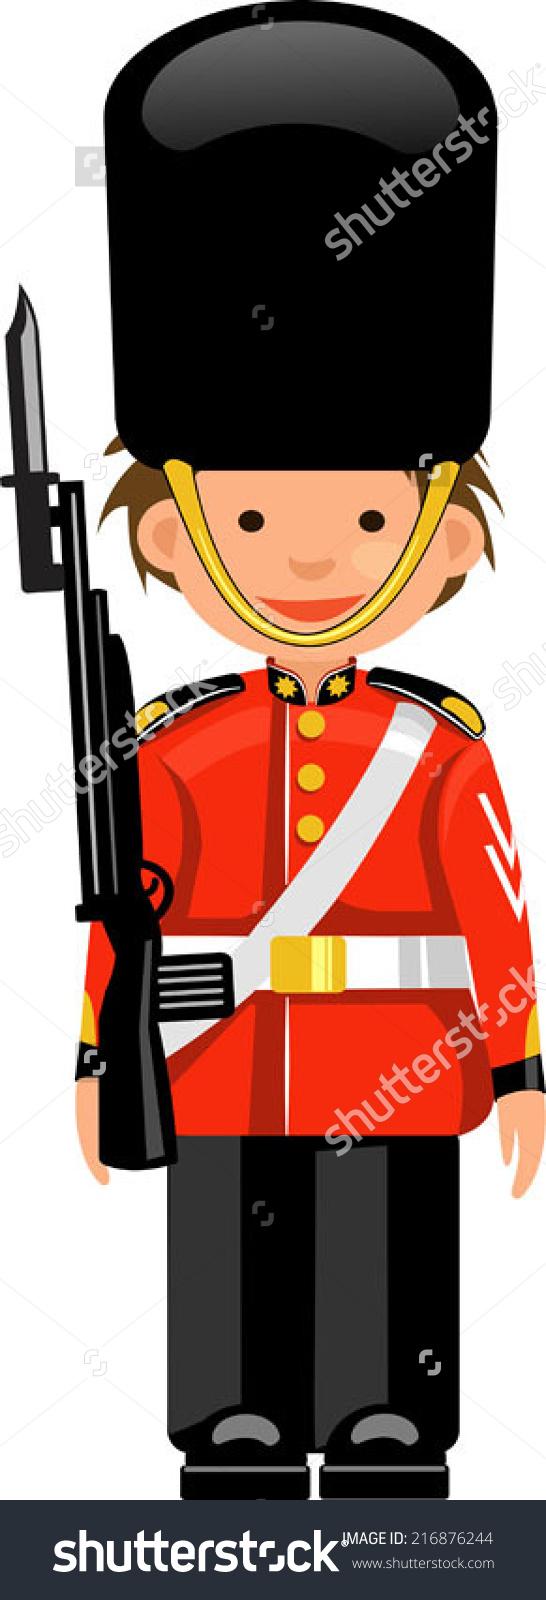 Queen clipart guards #3